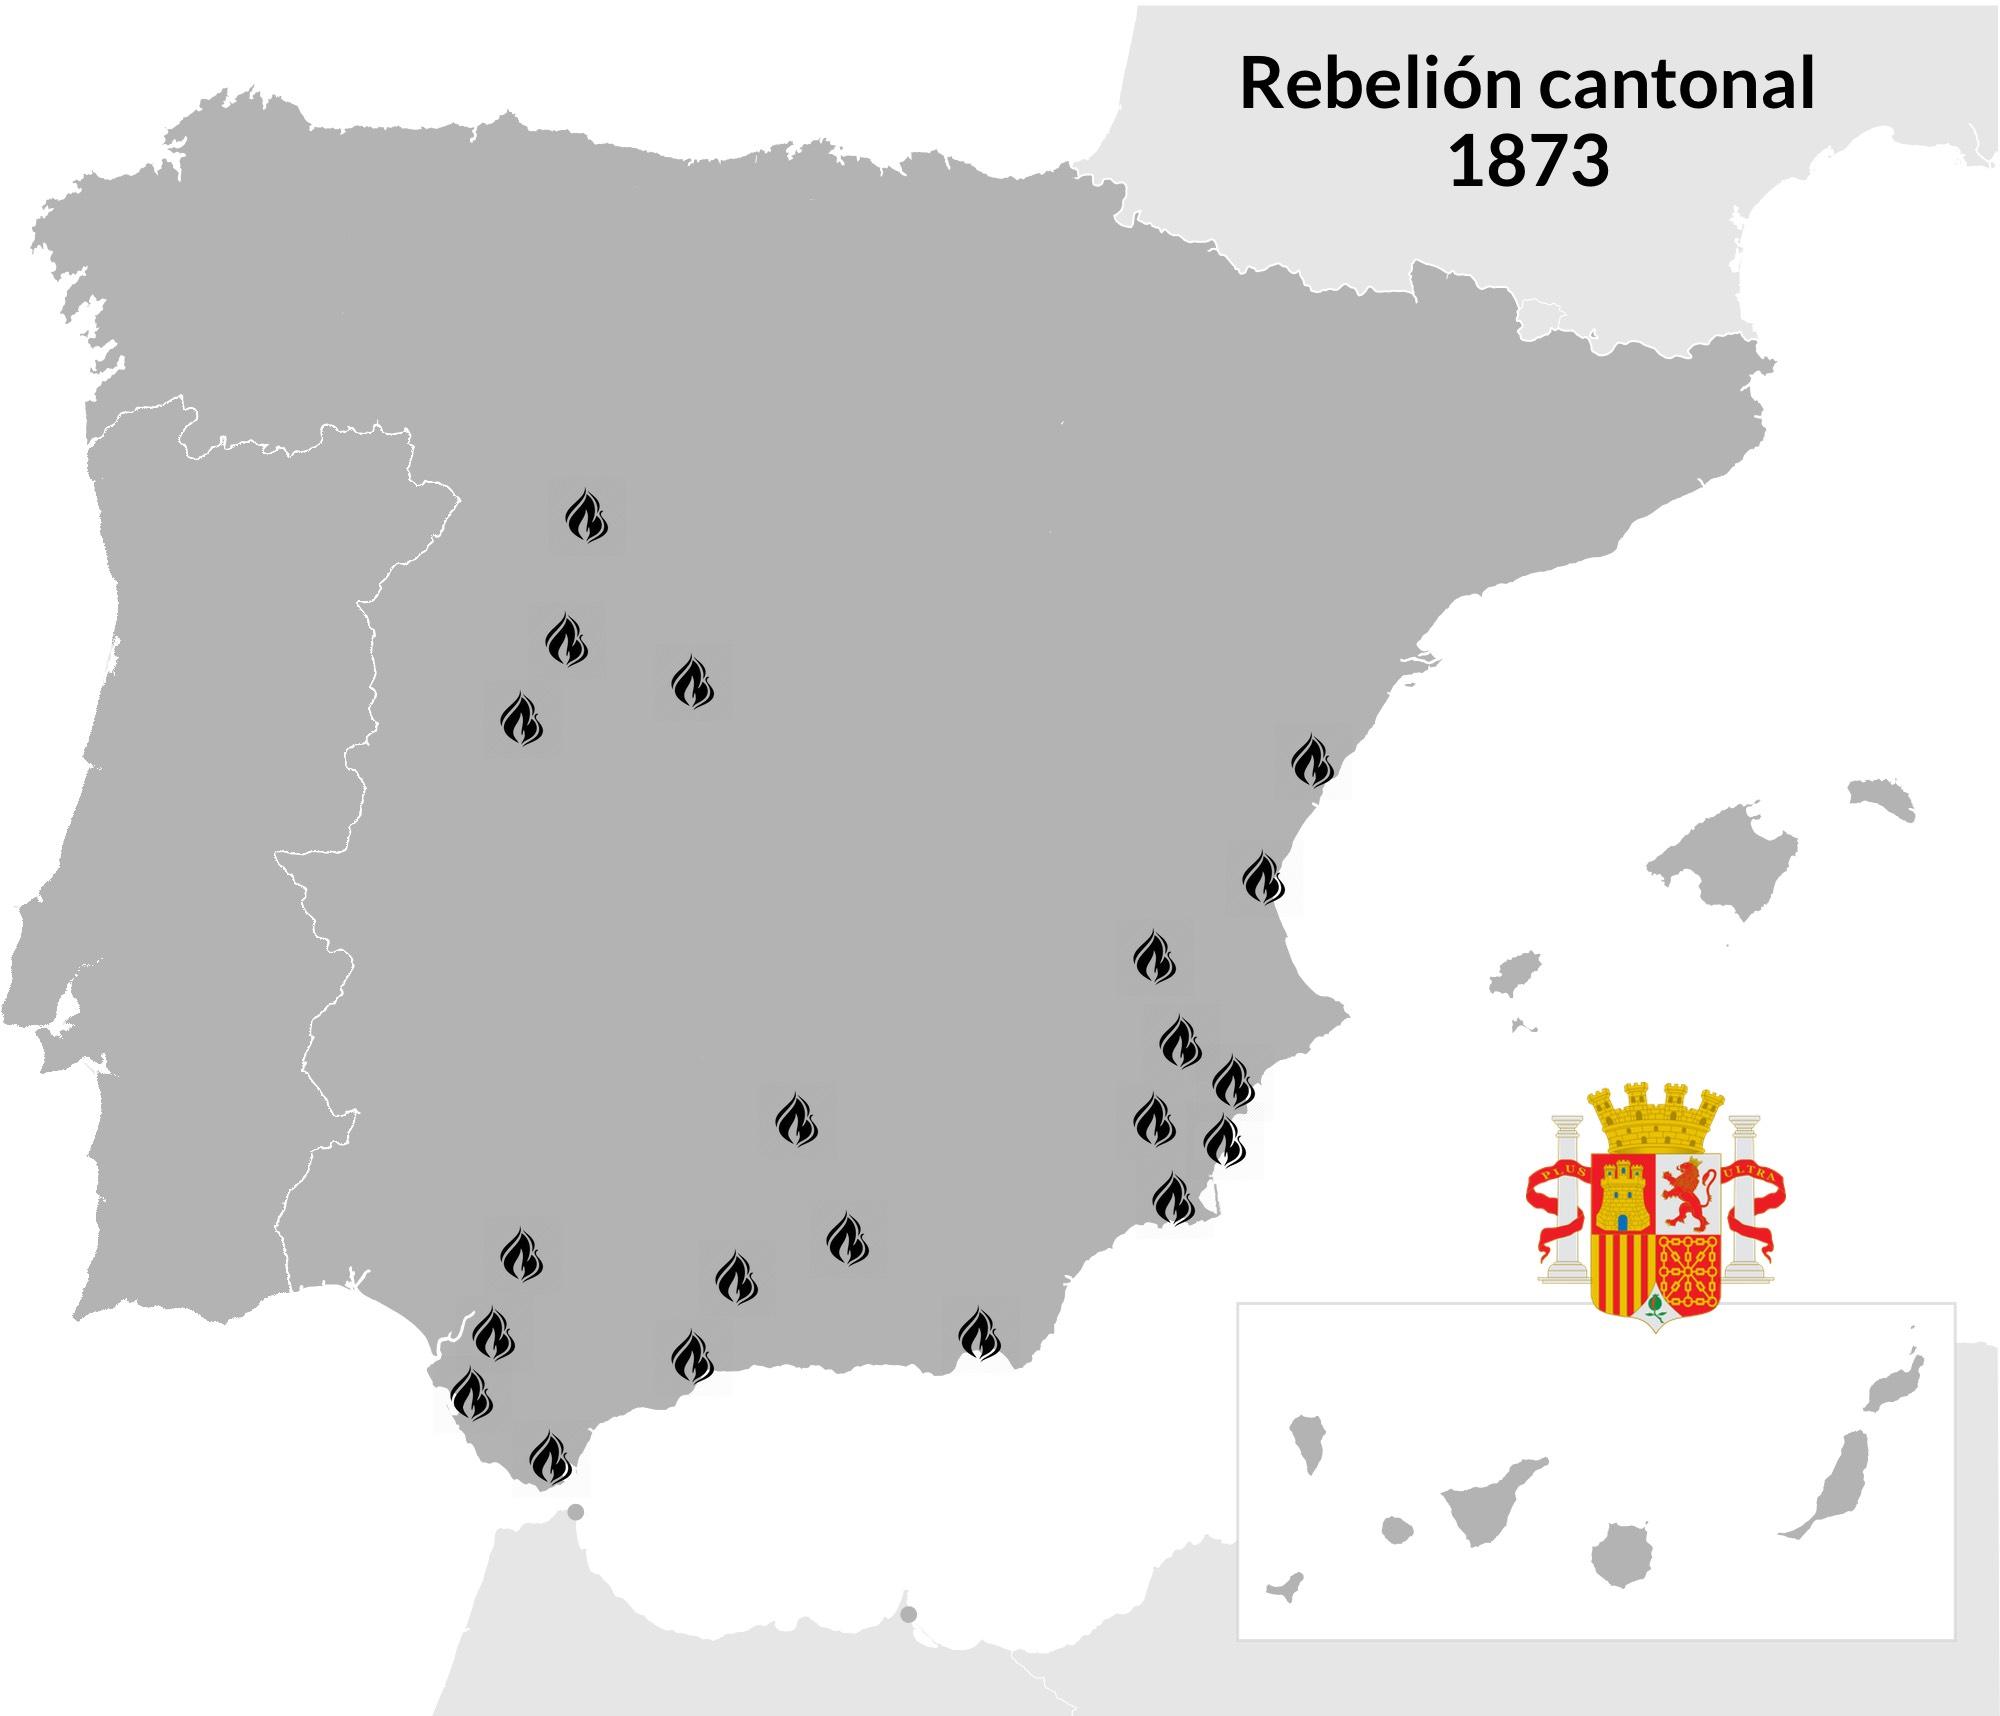 5-Rebelion Cantonal